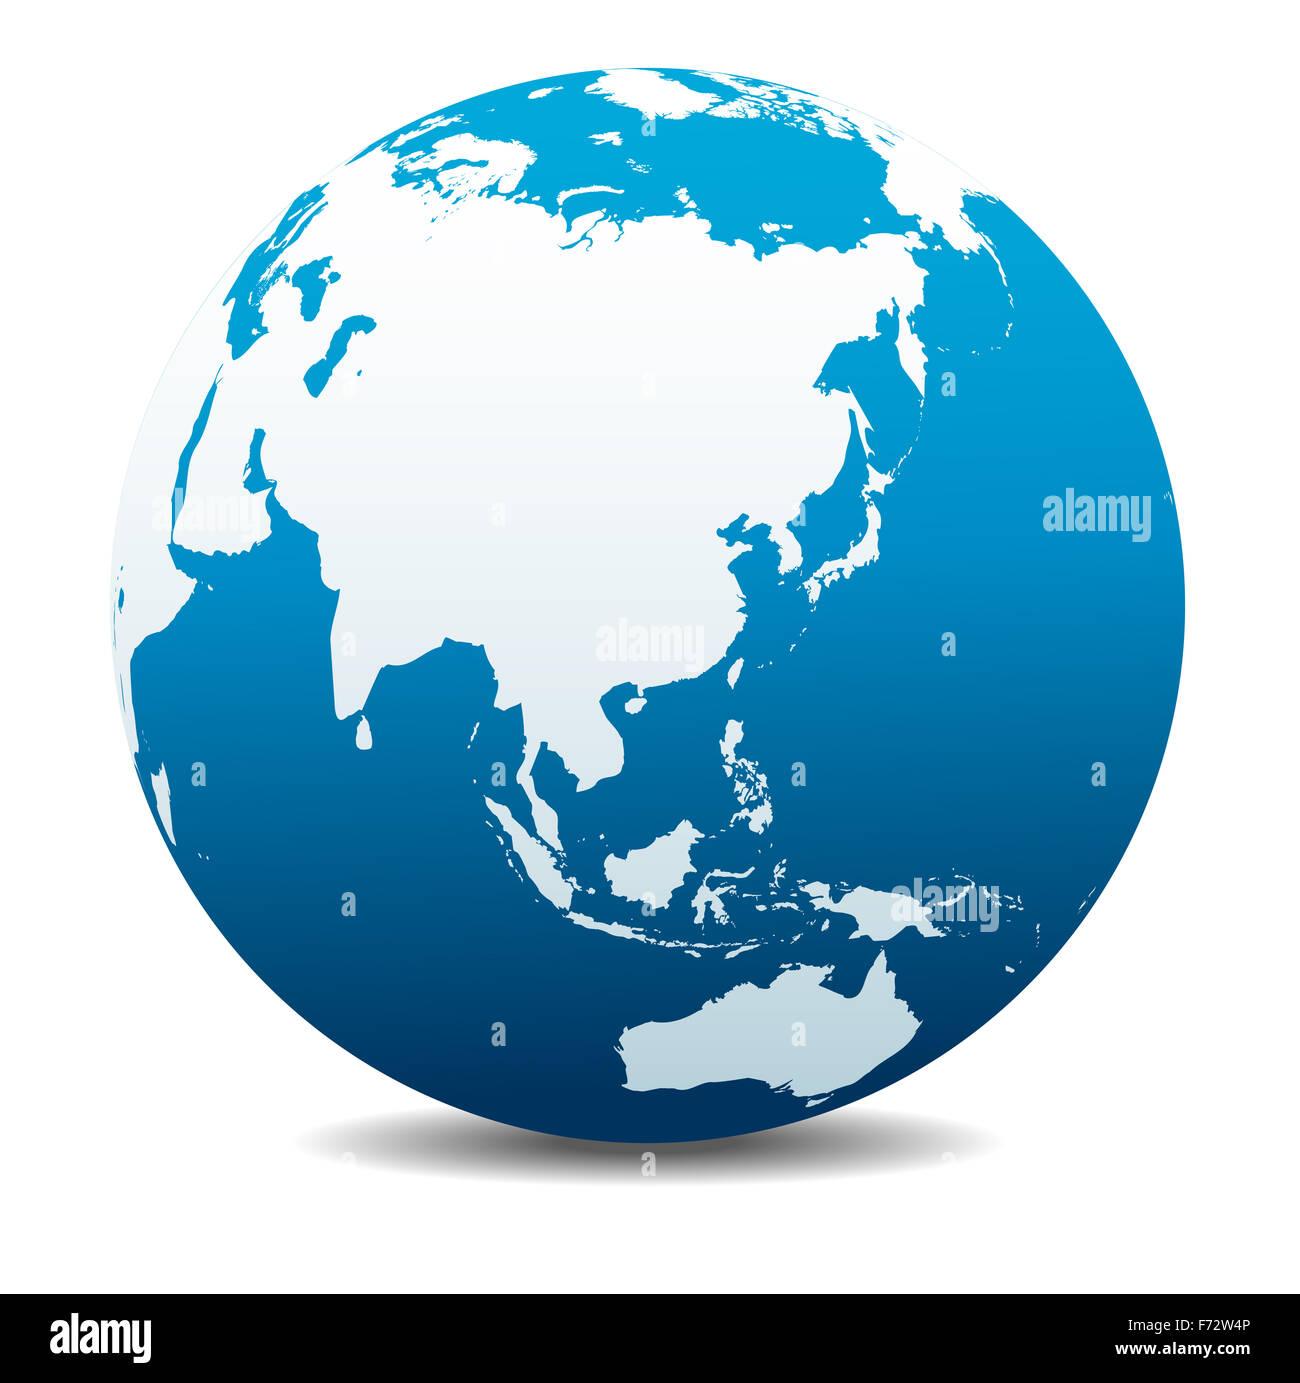 China, Japan, Malaysia, Thailand, Indonesia, Global World - Stock Image